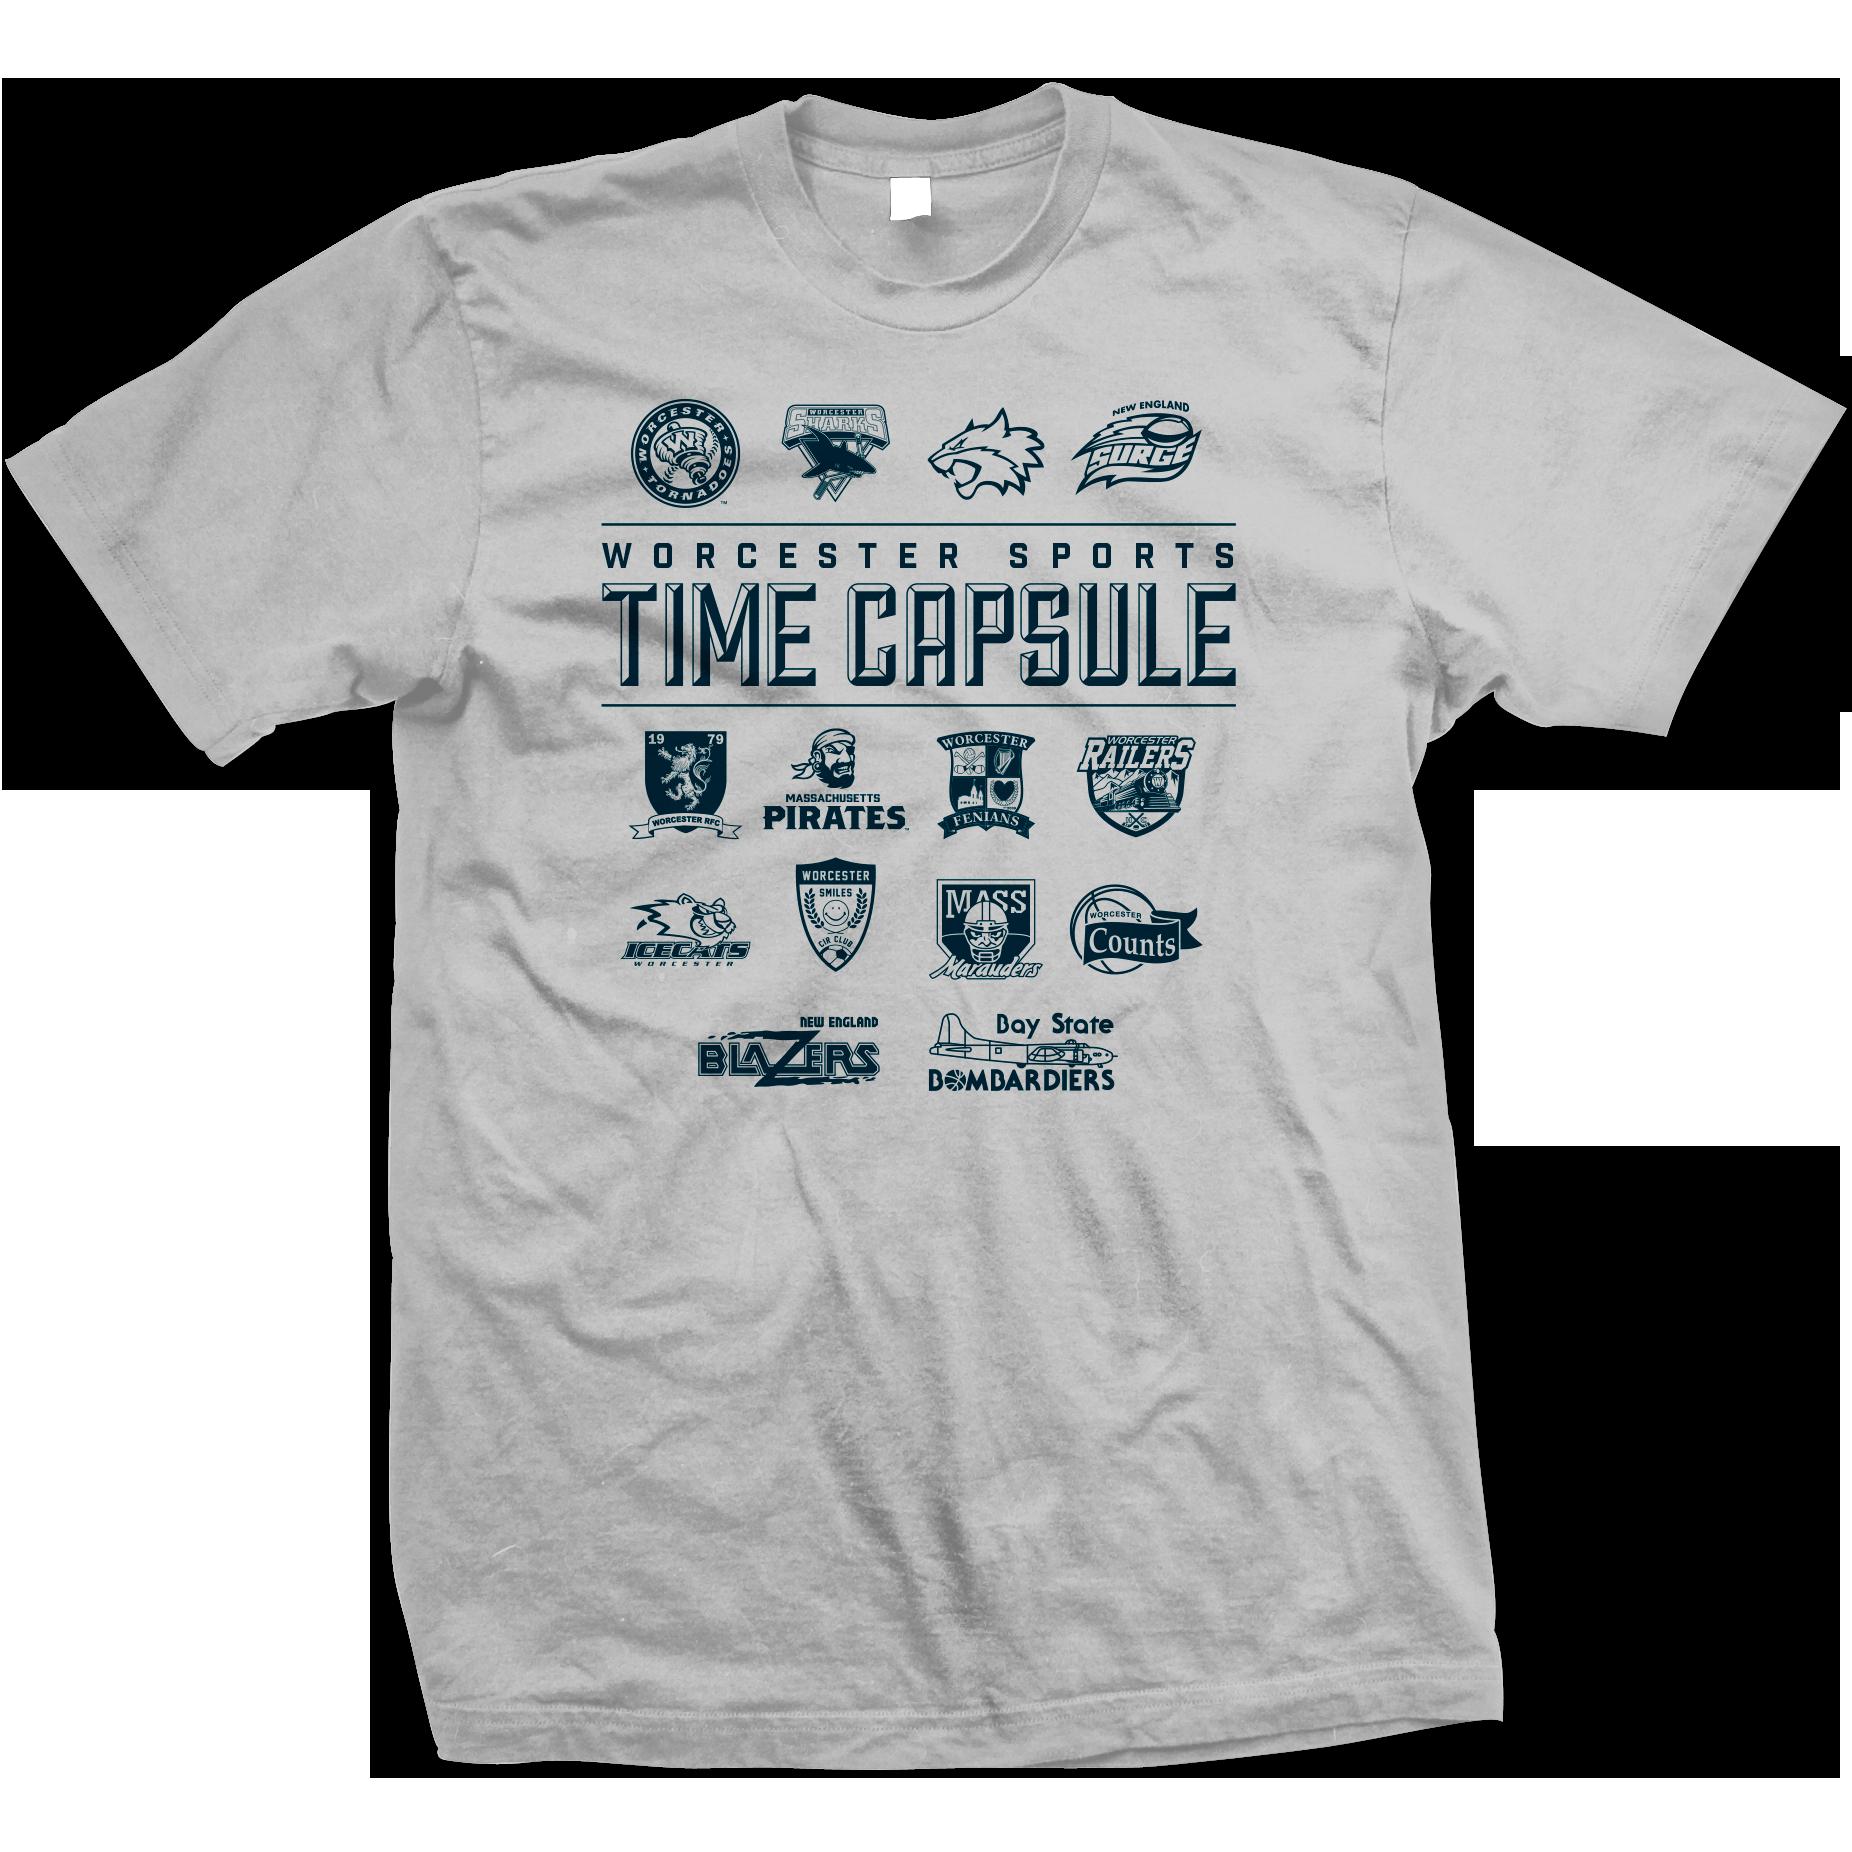 WB_Shirt_Time_Capsule_01.png